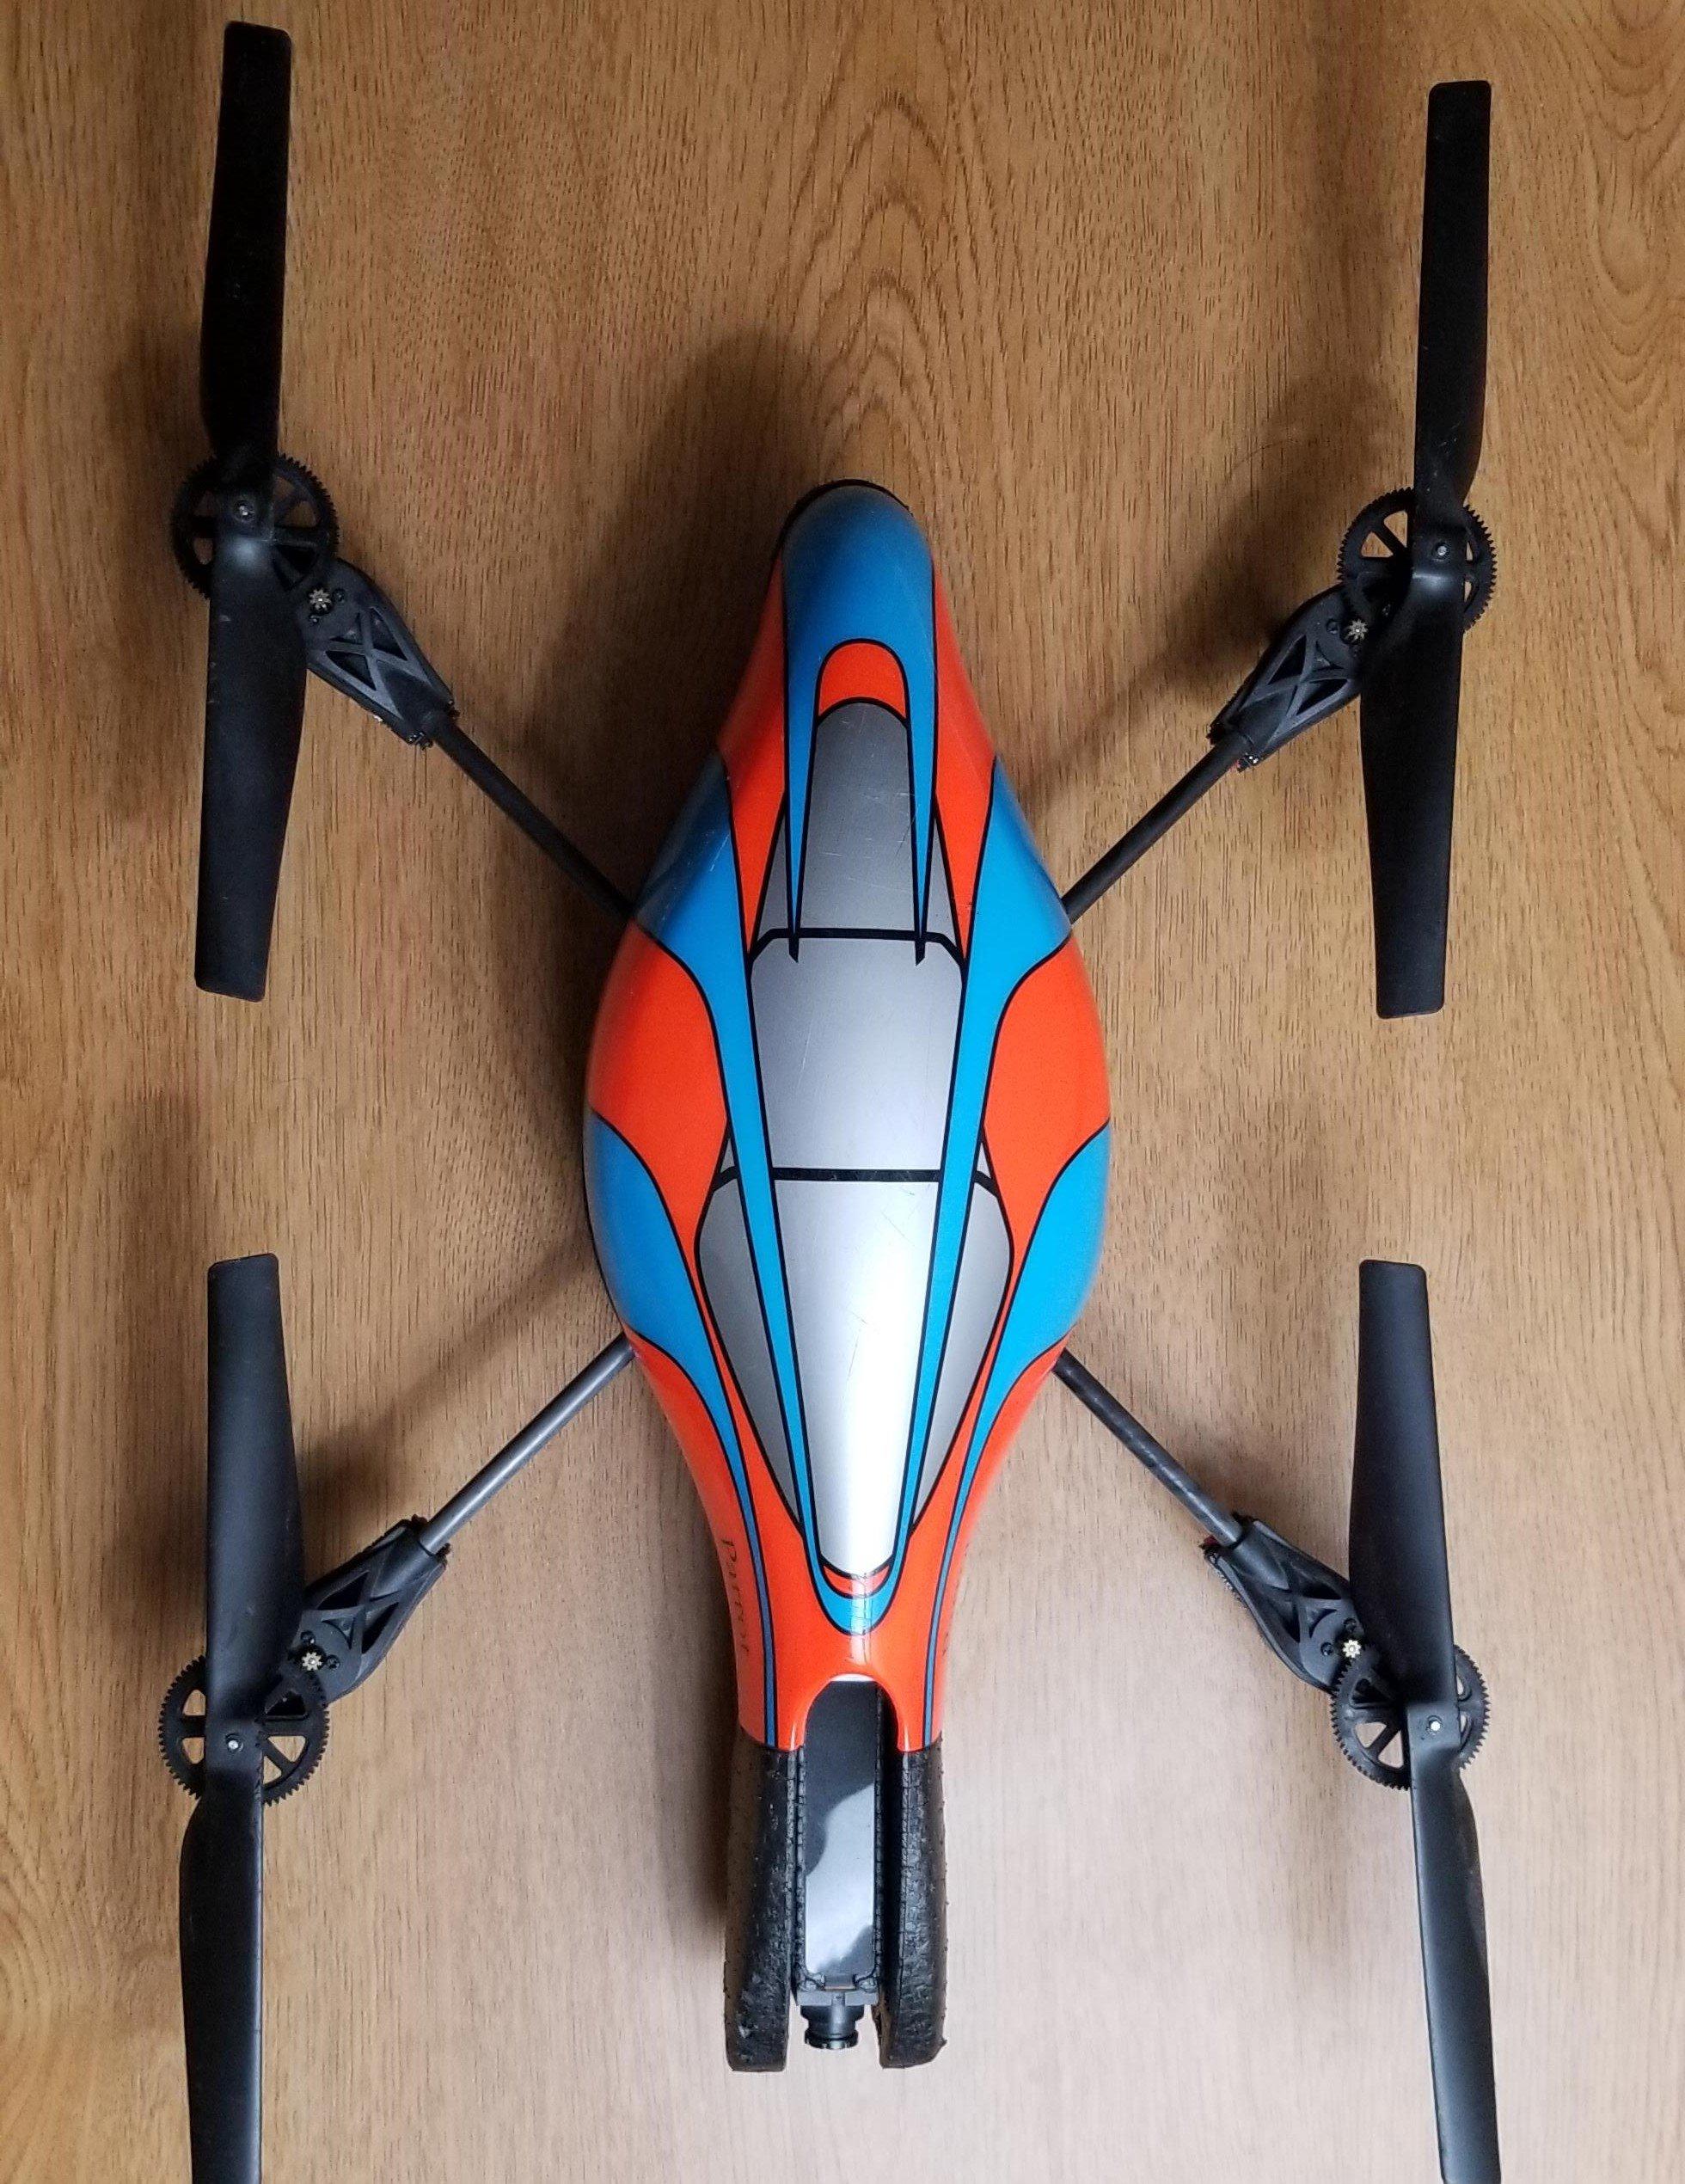 Parrot AR Drone Image